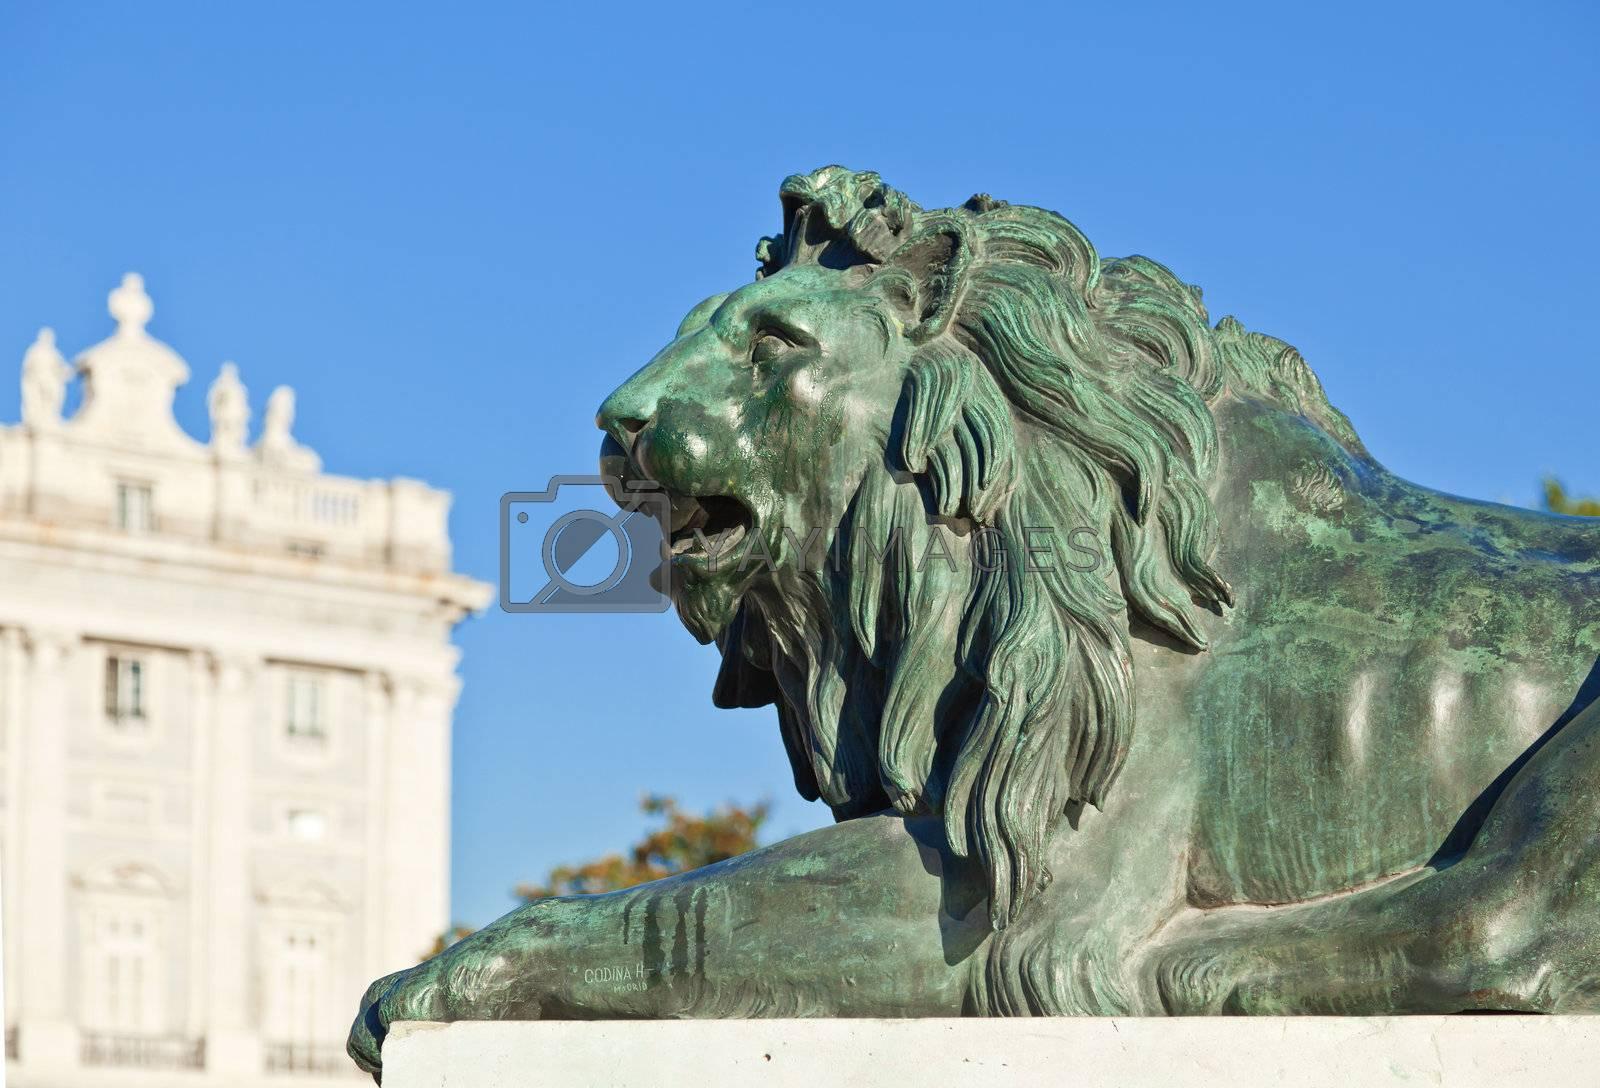 Madrid Plaza de Oriente, statue of lion. Madrid, Spain